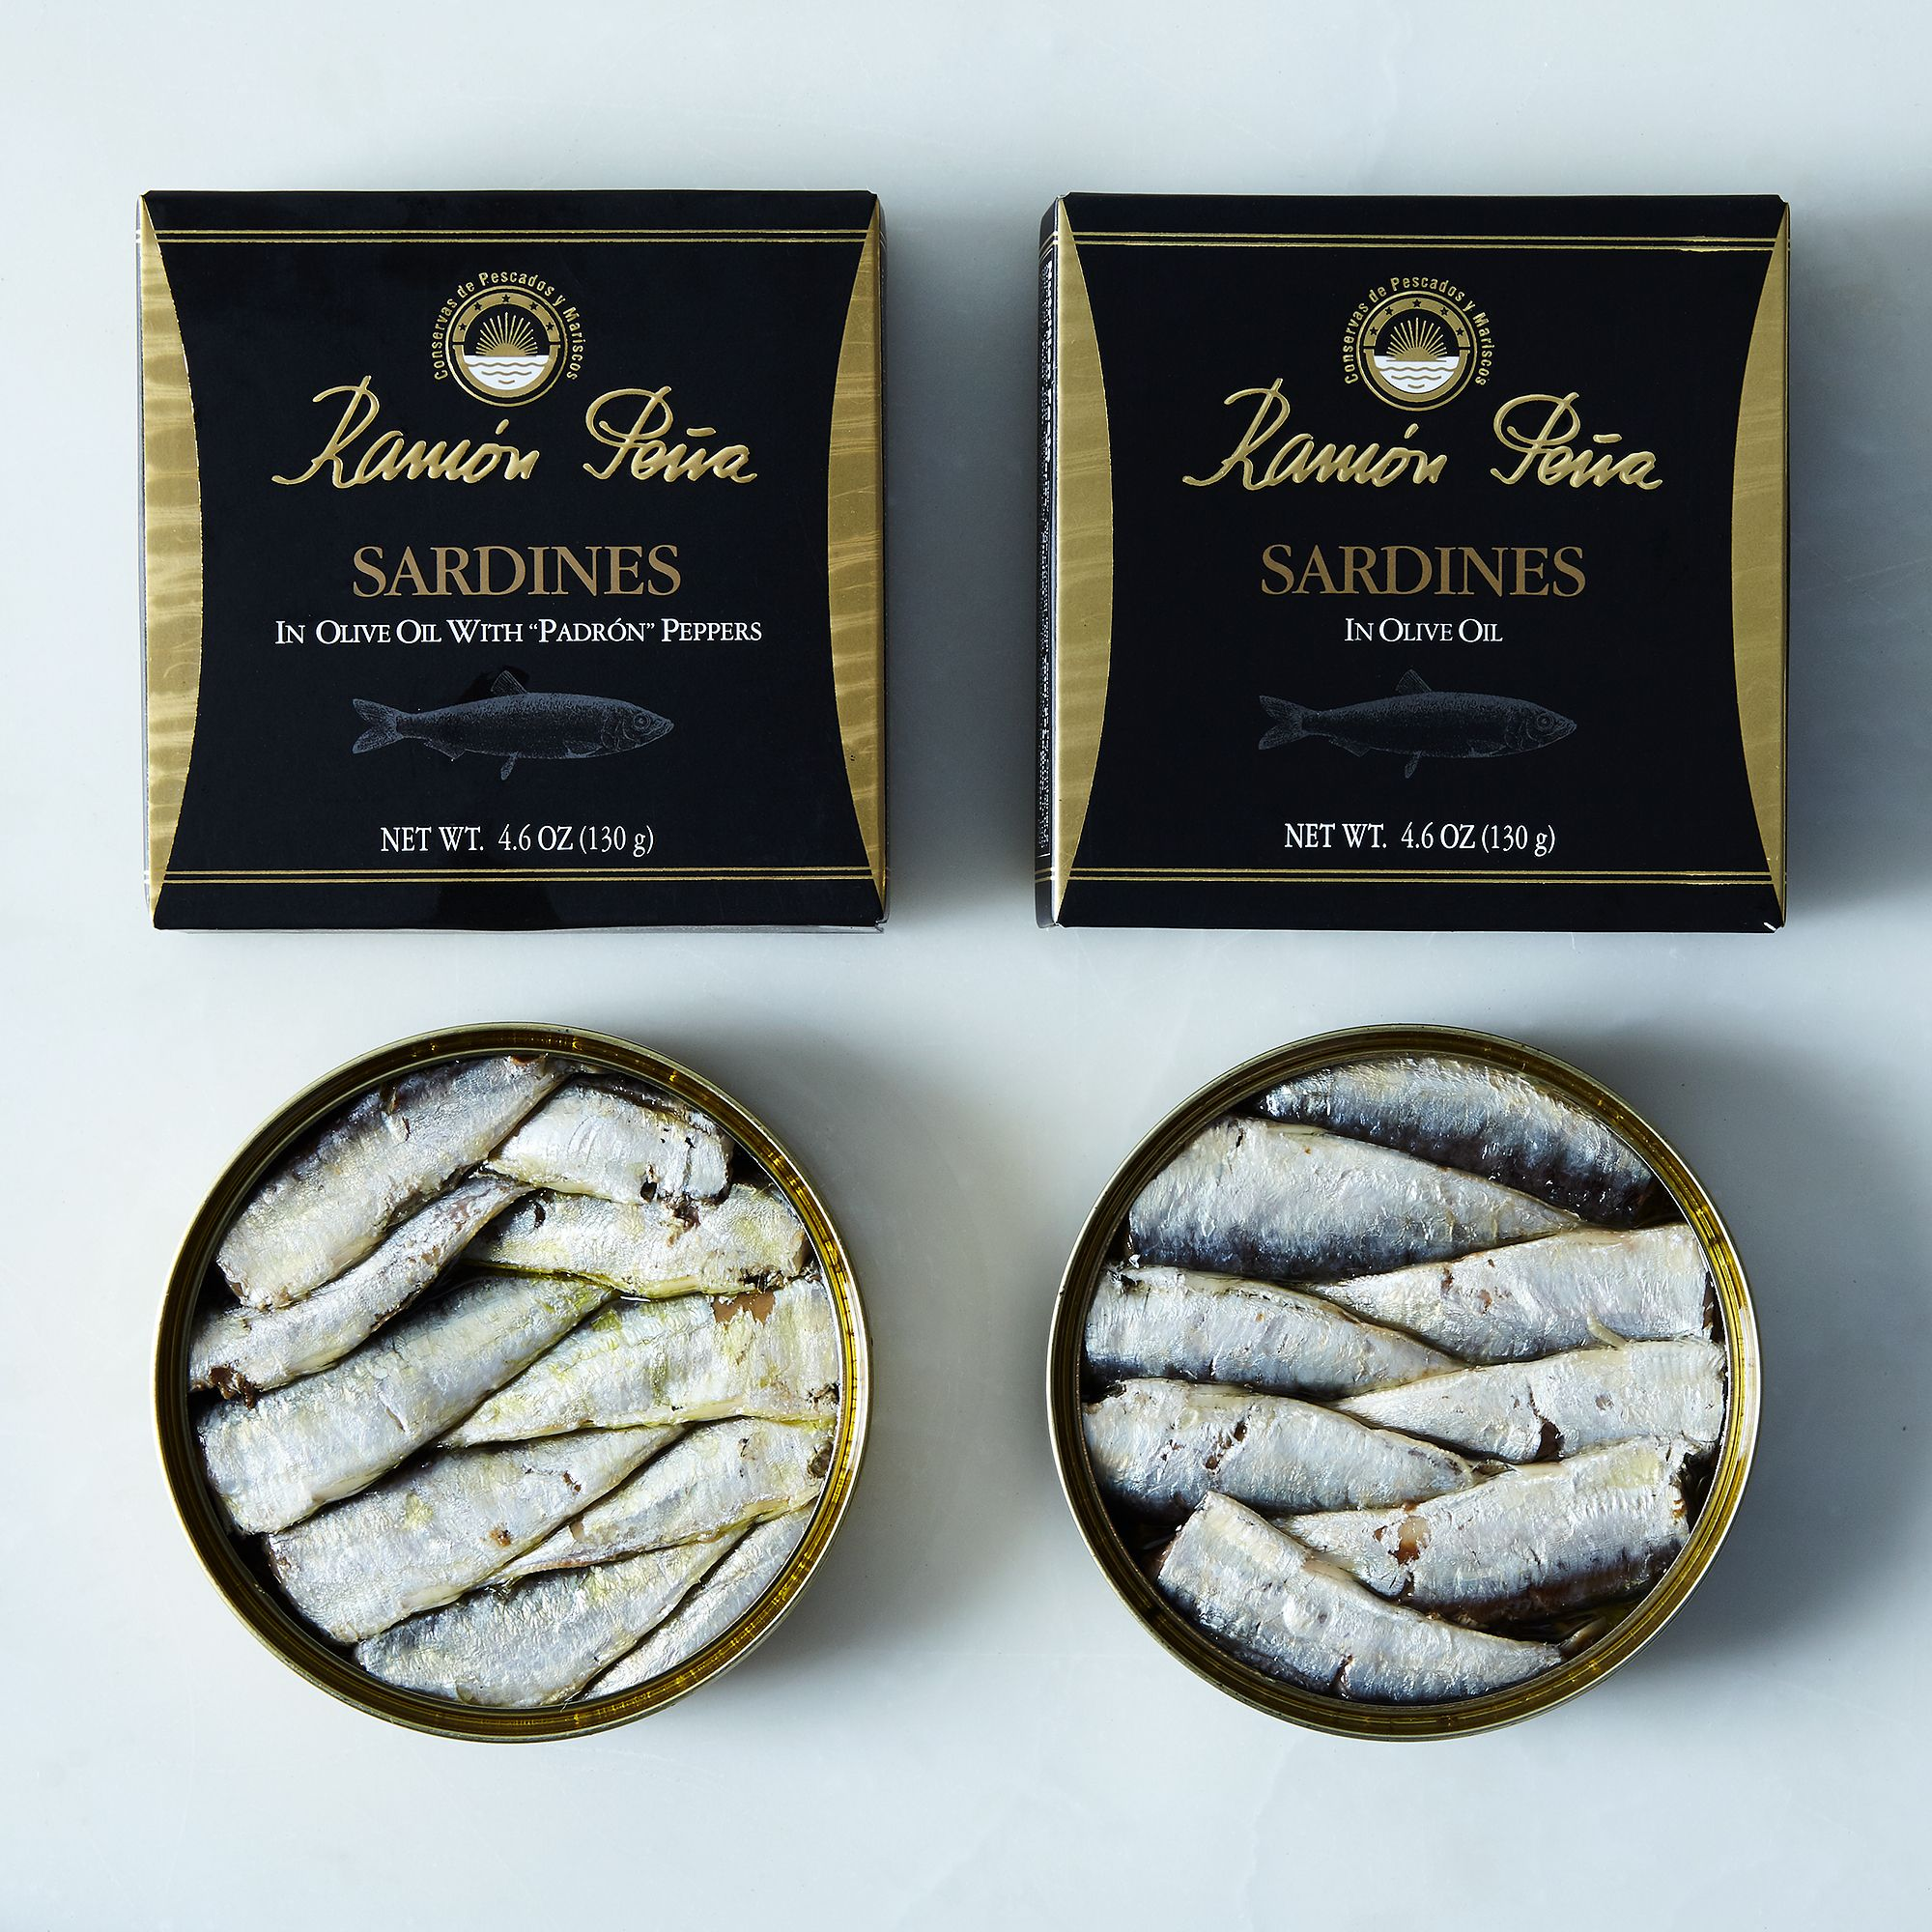 62f7ea9a 0f26 412b b882 c598e289b5c7  2016 1207 la tienda ramon pena spanish seafood sardines silo rocky luten 226